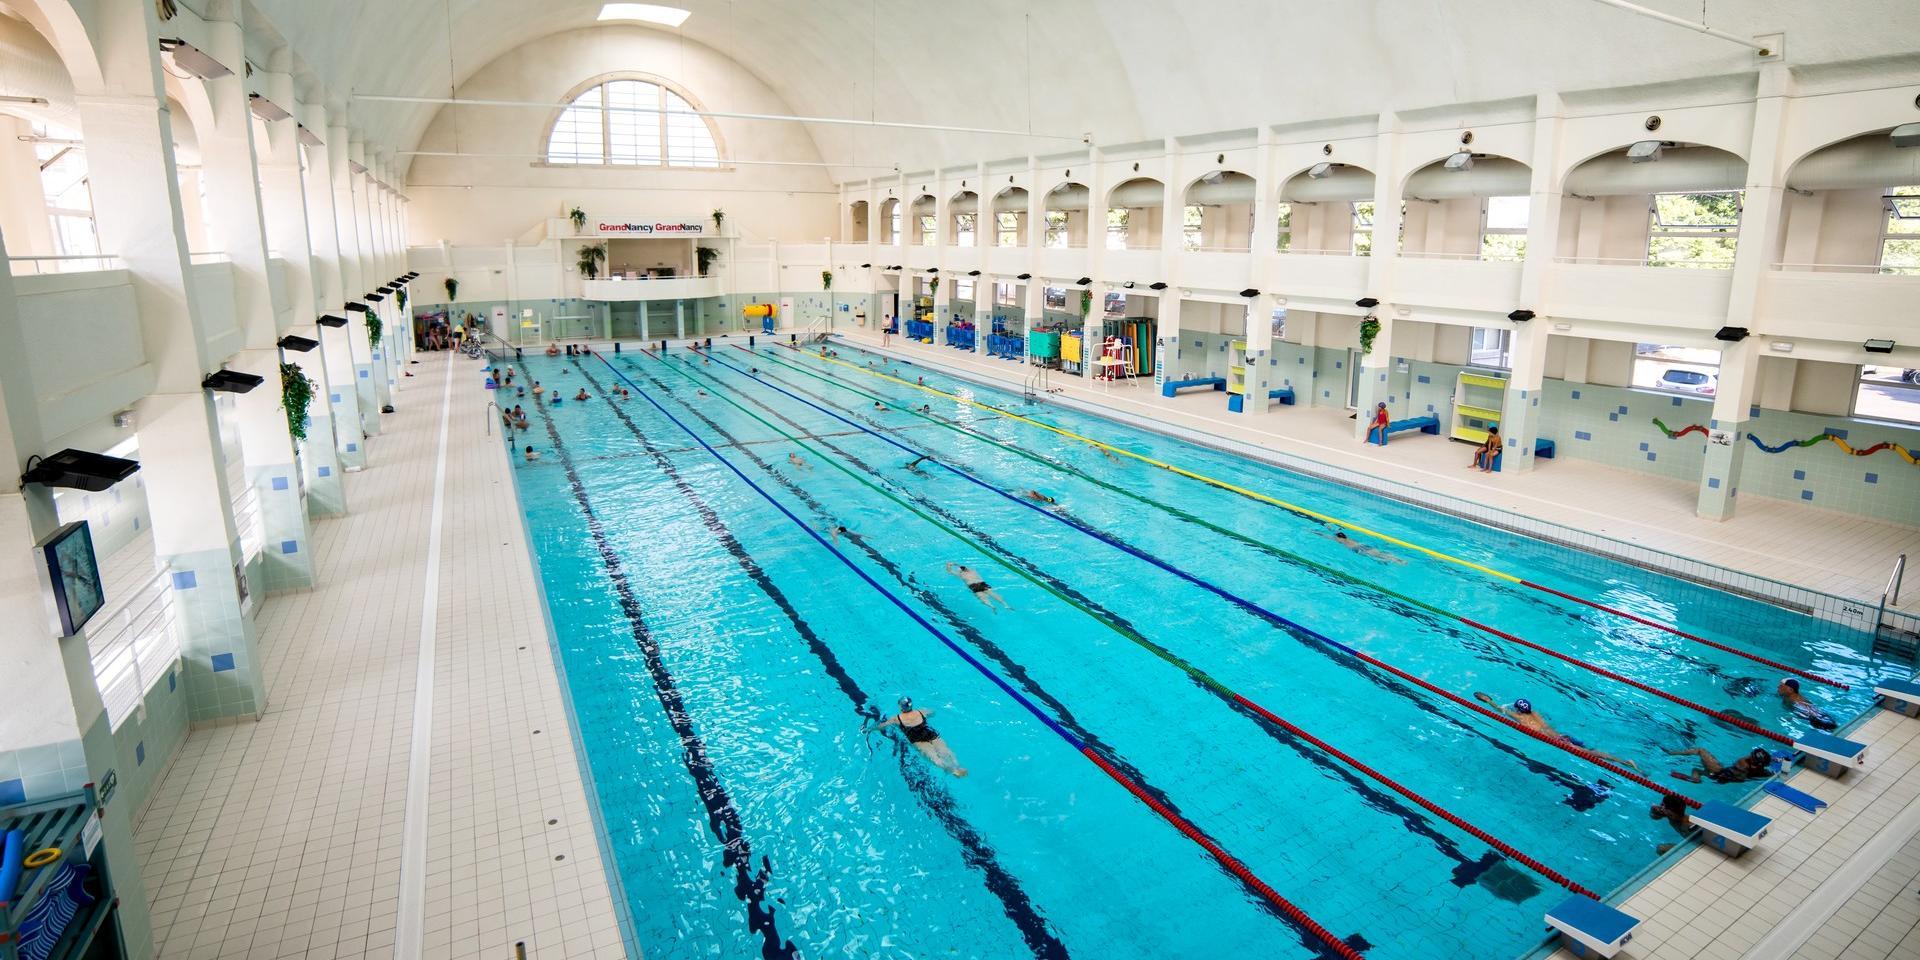 Schwimmbad Und Grand Nancy Thermal | Nancy Tourisme tout Piscine Du Lido